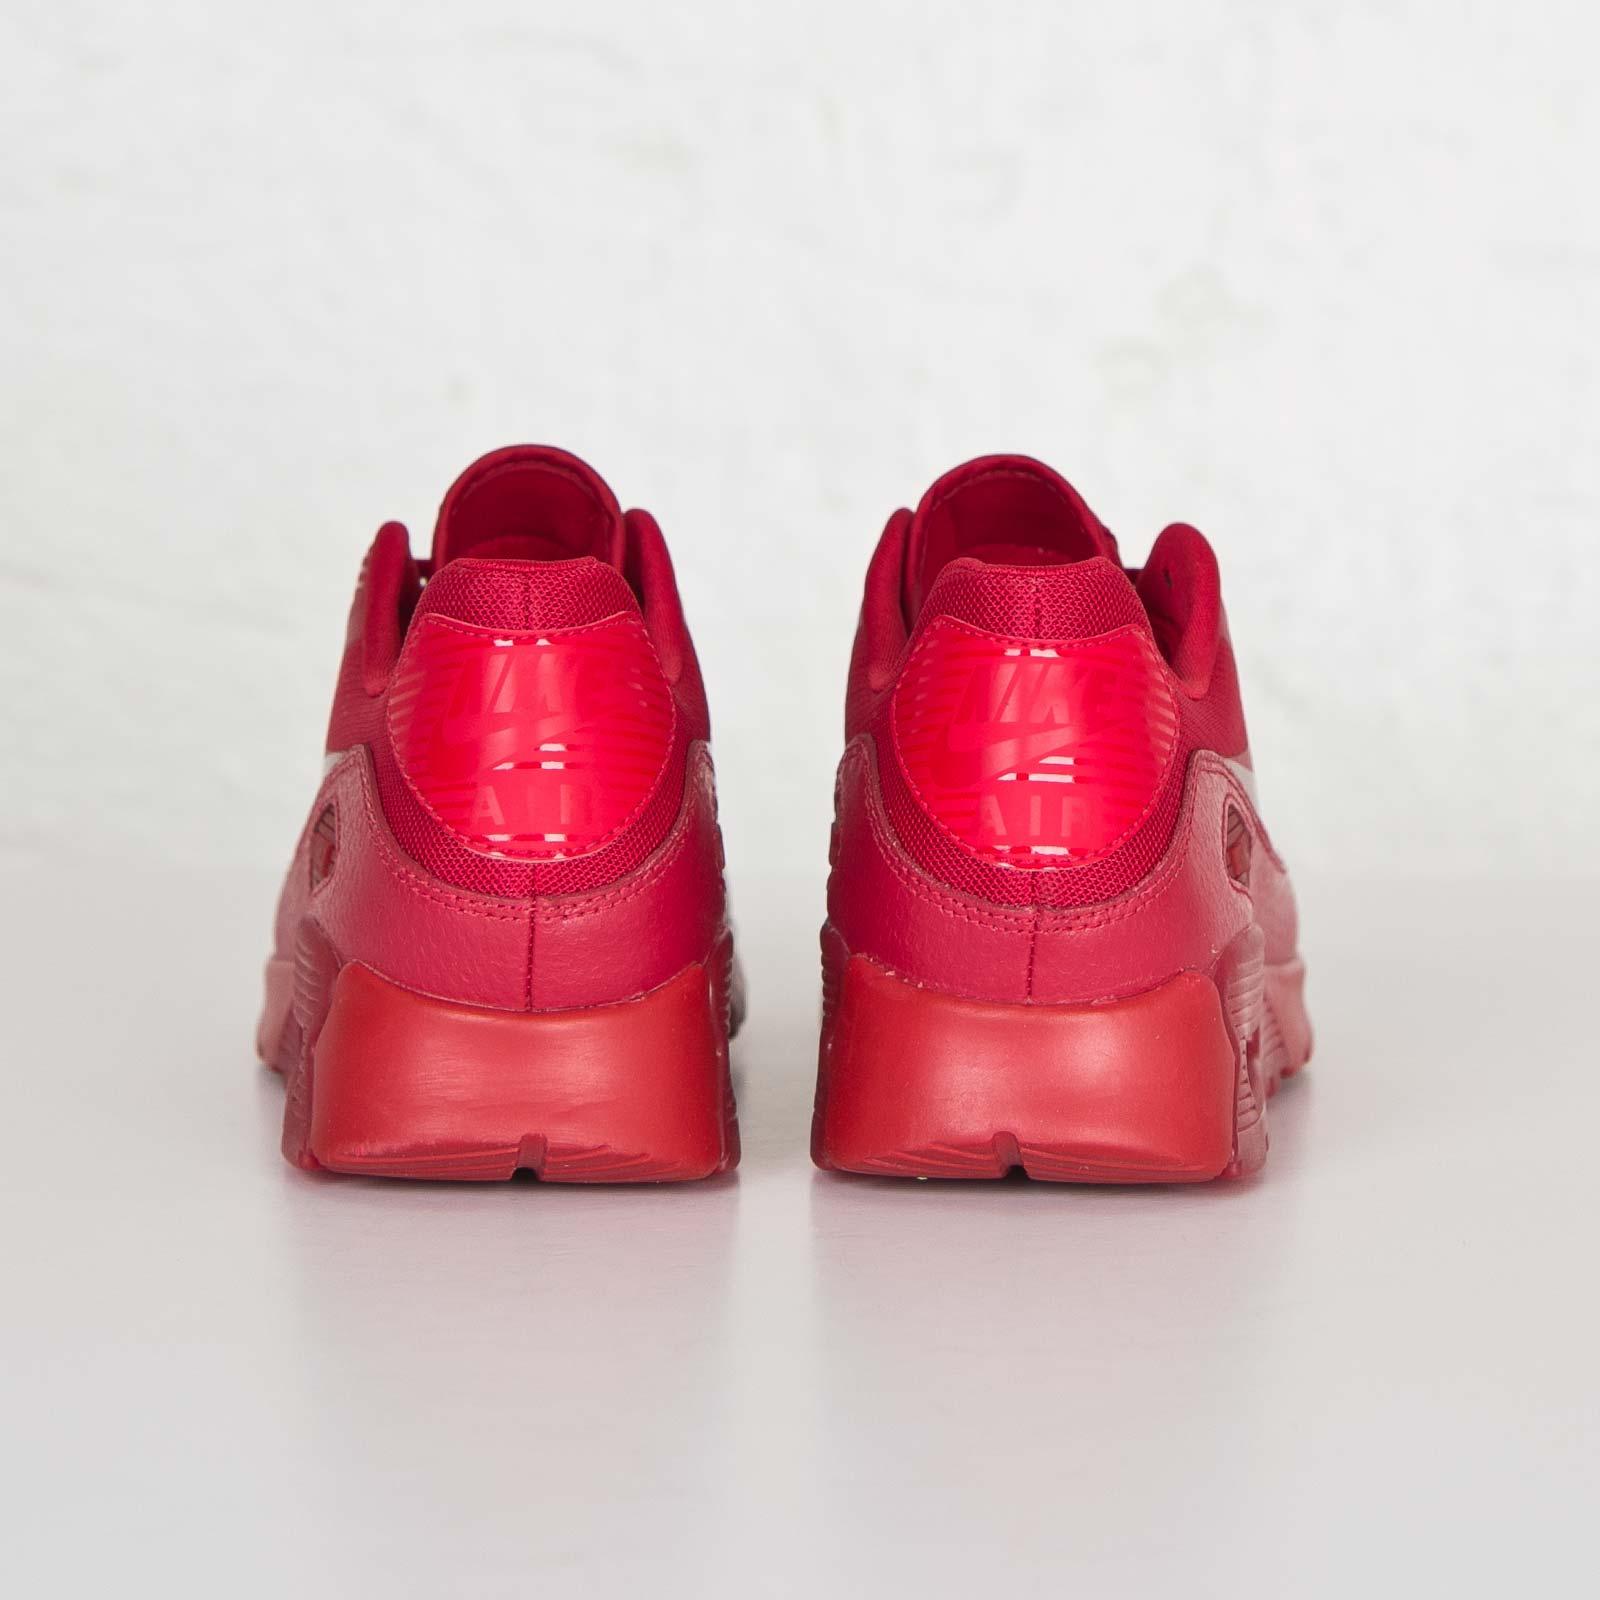 online retailer b7e1b 297b6 Nike W Air Max 90 Ultra Essential - 724981-601 - Sneakersnstuff   sneakers    streetwear online since 1999